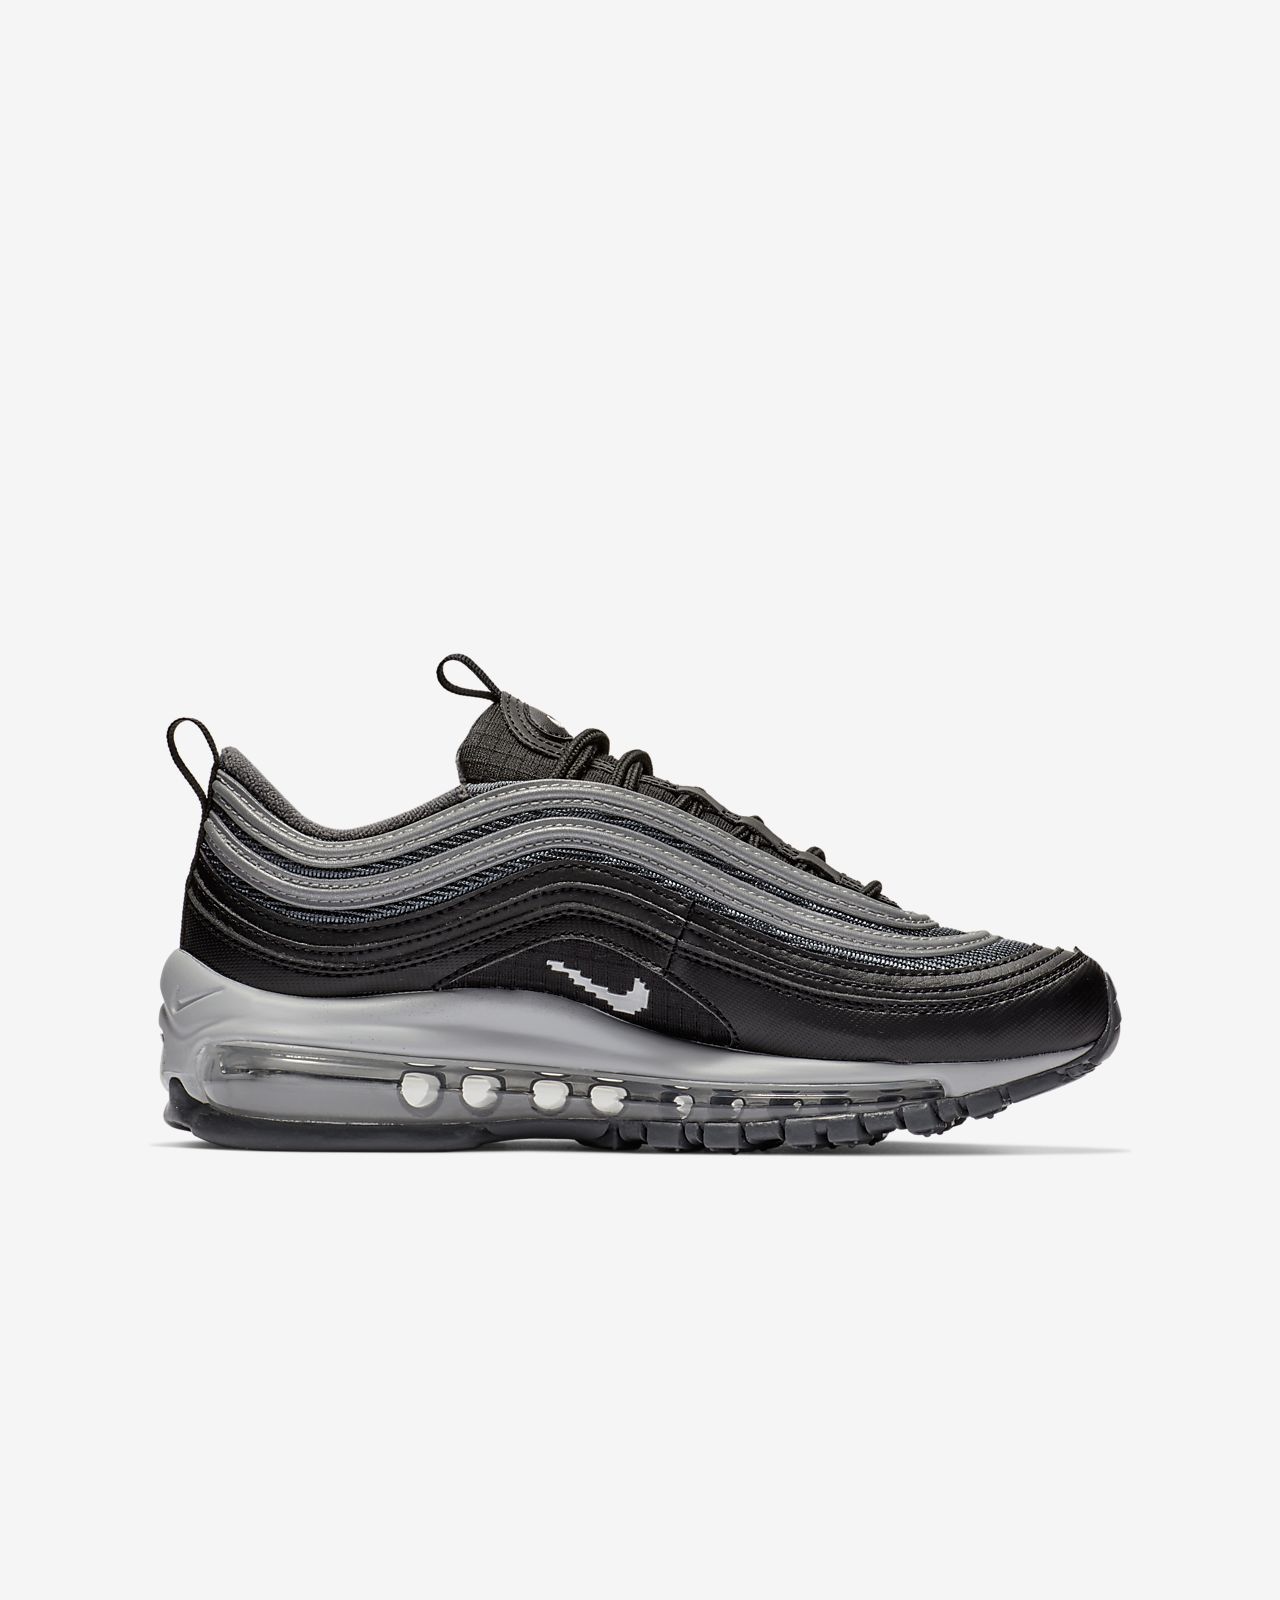 brand new 3c87a 2ec09 ... Nike Air Max 97 Y2K Older Kids  Shoe